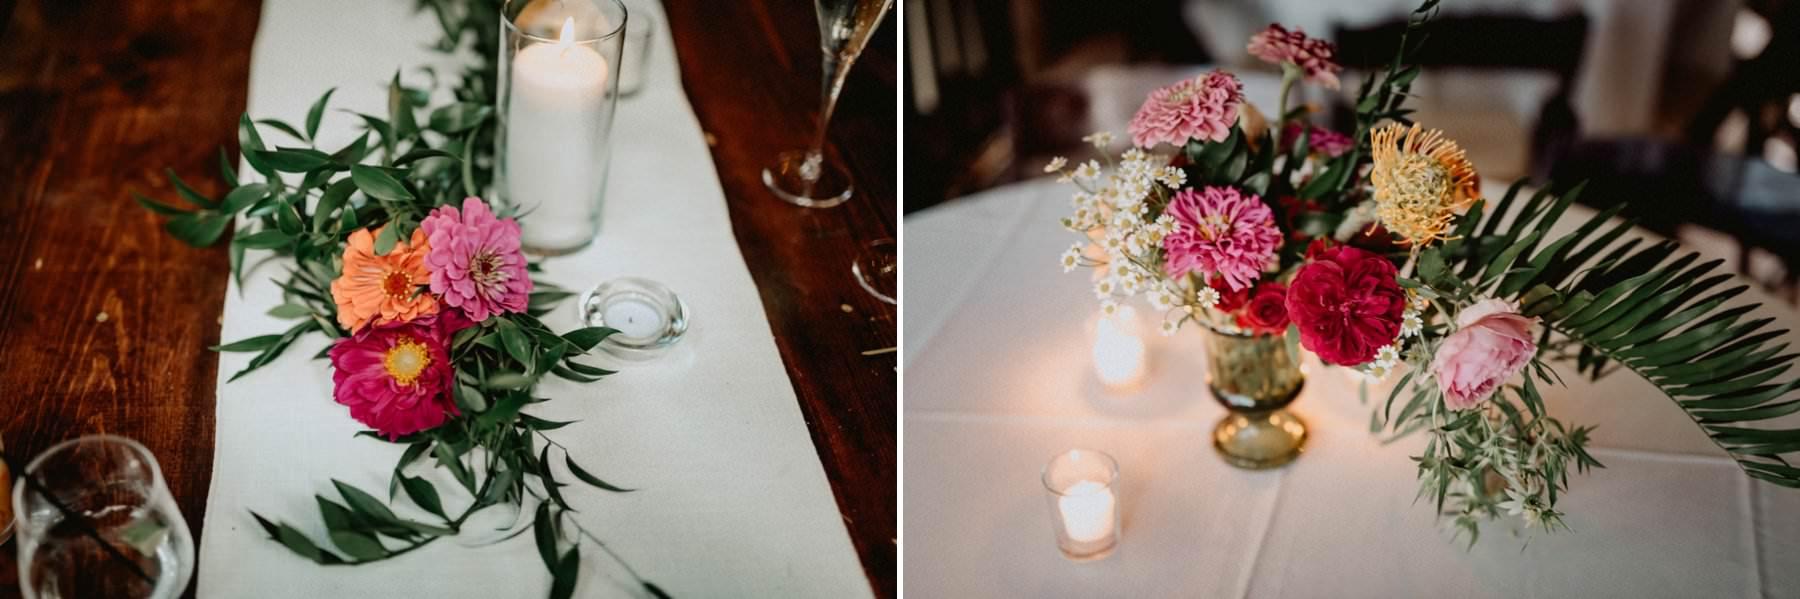 pennsylvania-private-estate-wedding-102.jpg